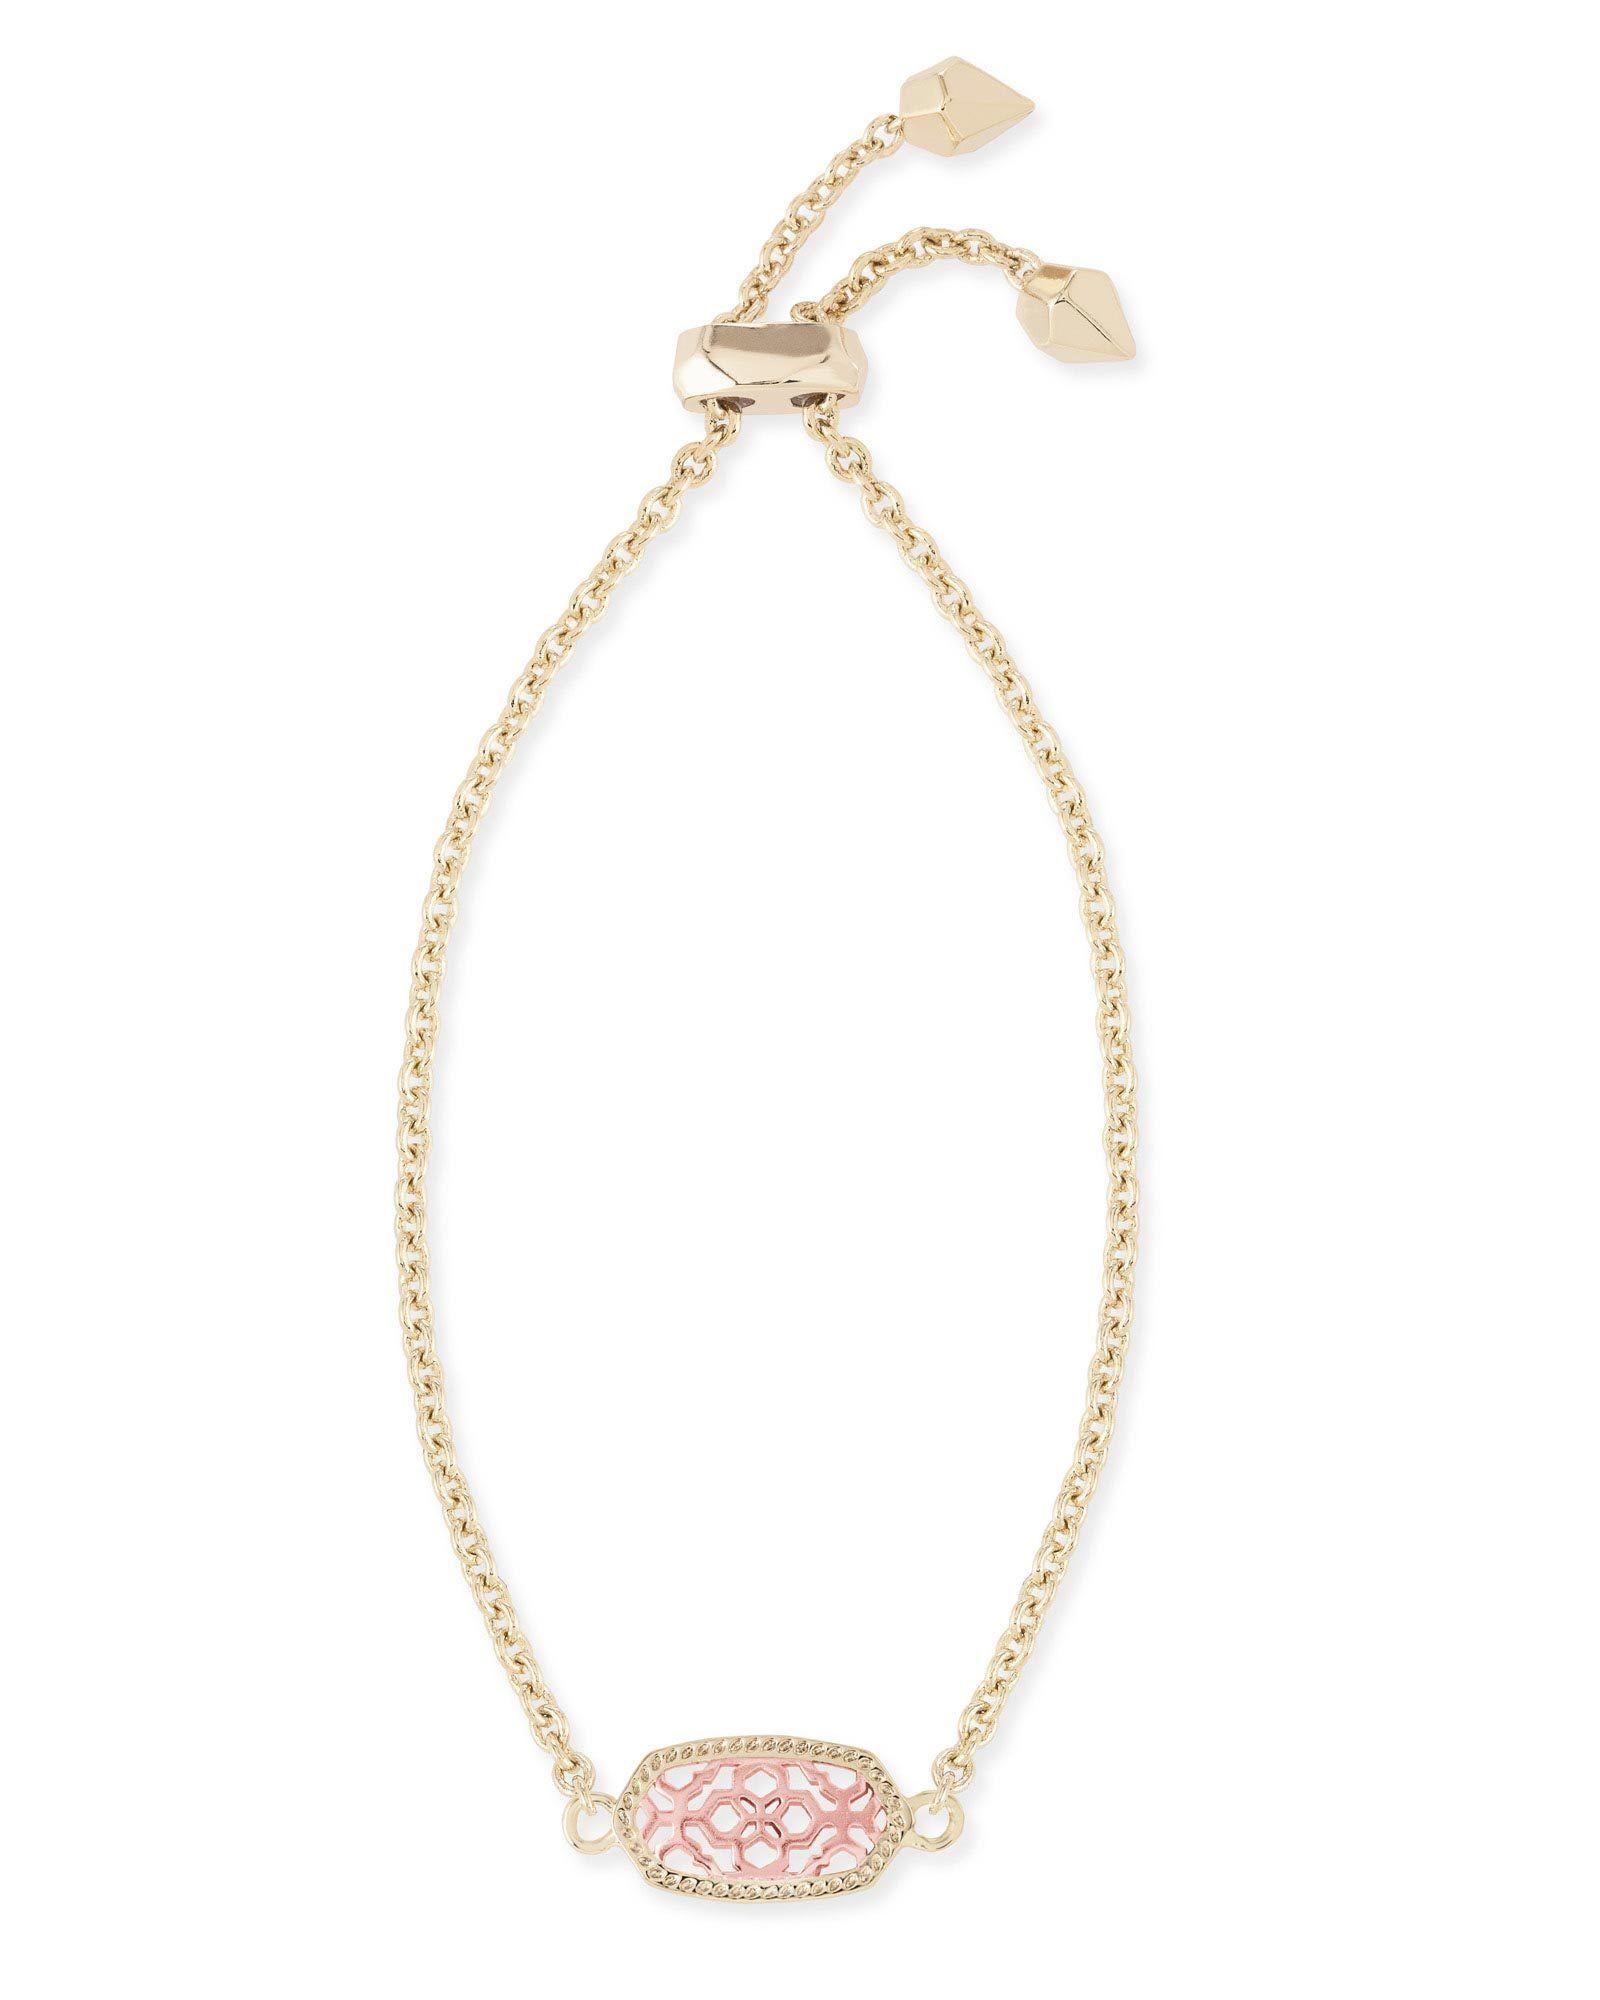 Kendra scott elaina bracelet gold filigree delicate and layering